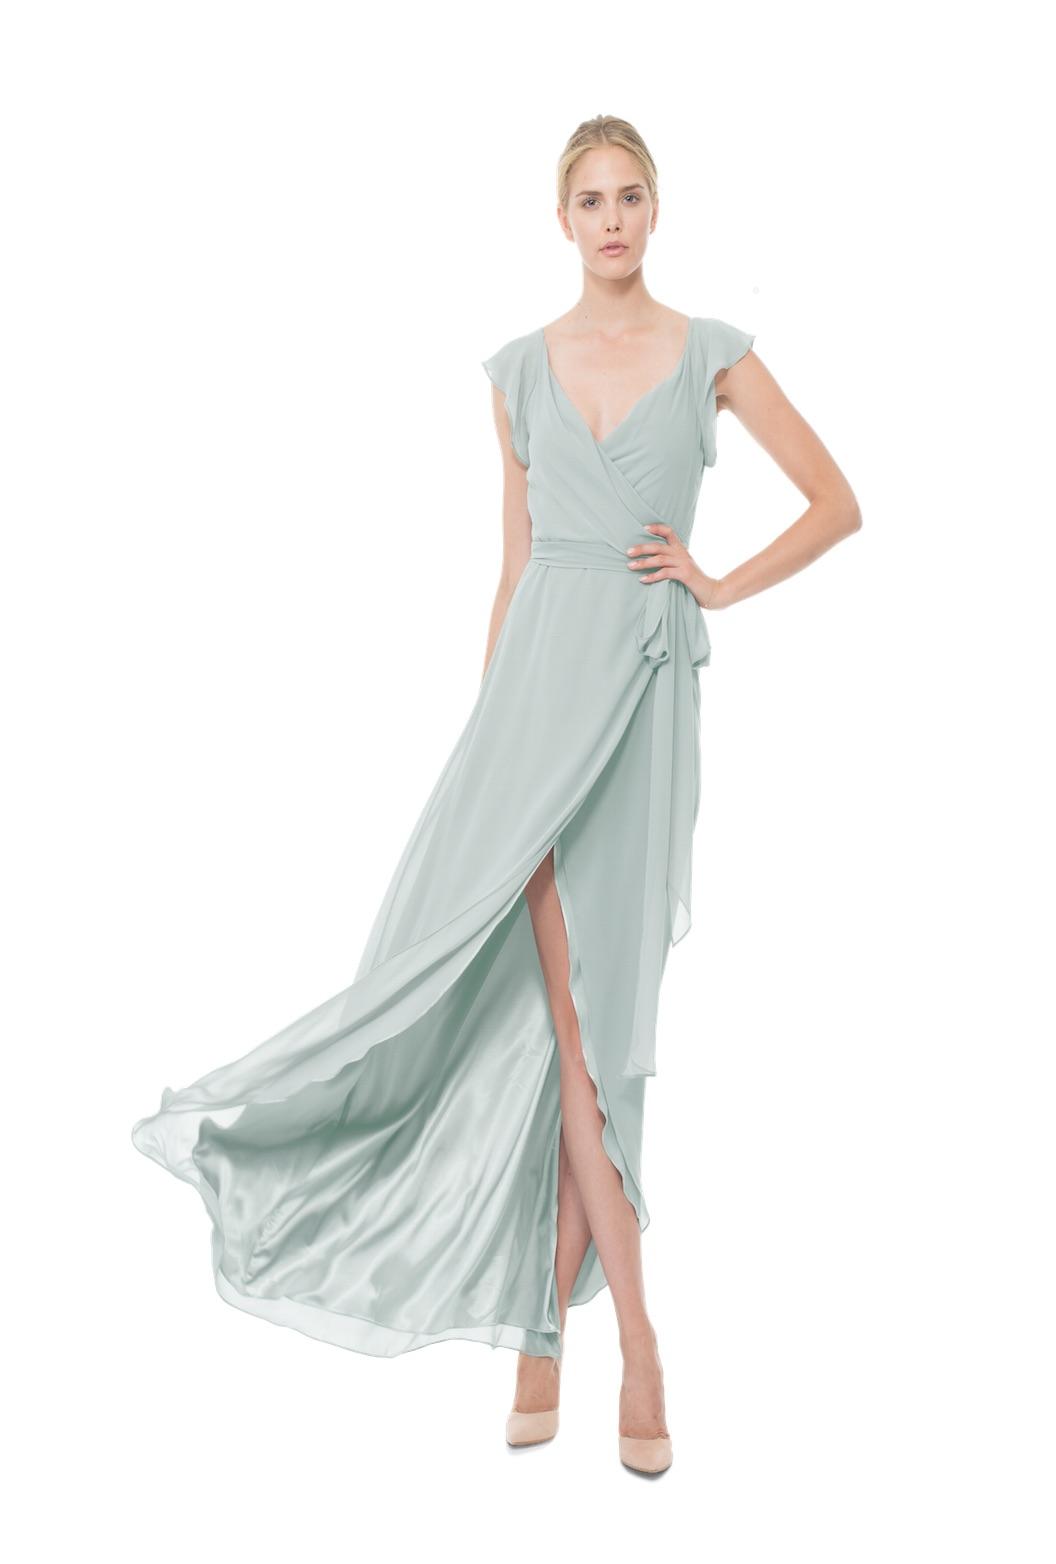 ivory-and-beau-bridal-boutique-savannah-wedding-dress-savannah-wedding-gown-savannah-bridal-boutique-savannah-bridal-shop-savannah-wedding-planner-rodan-and-fields-joanna-august-bridesmaids-dorian.jpg